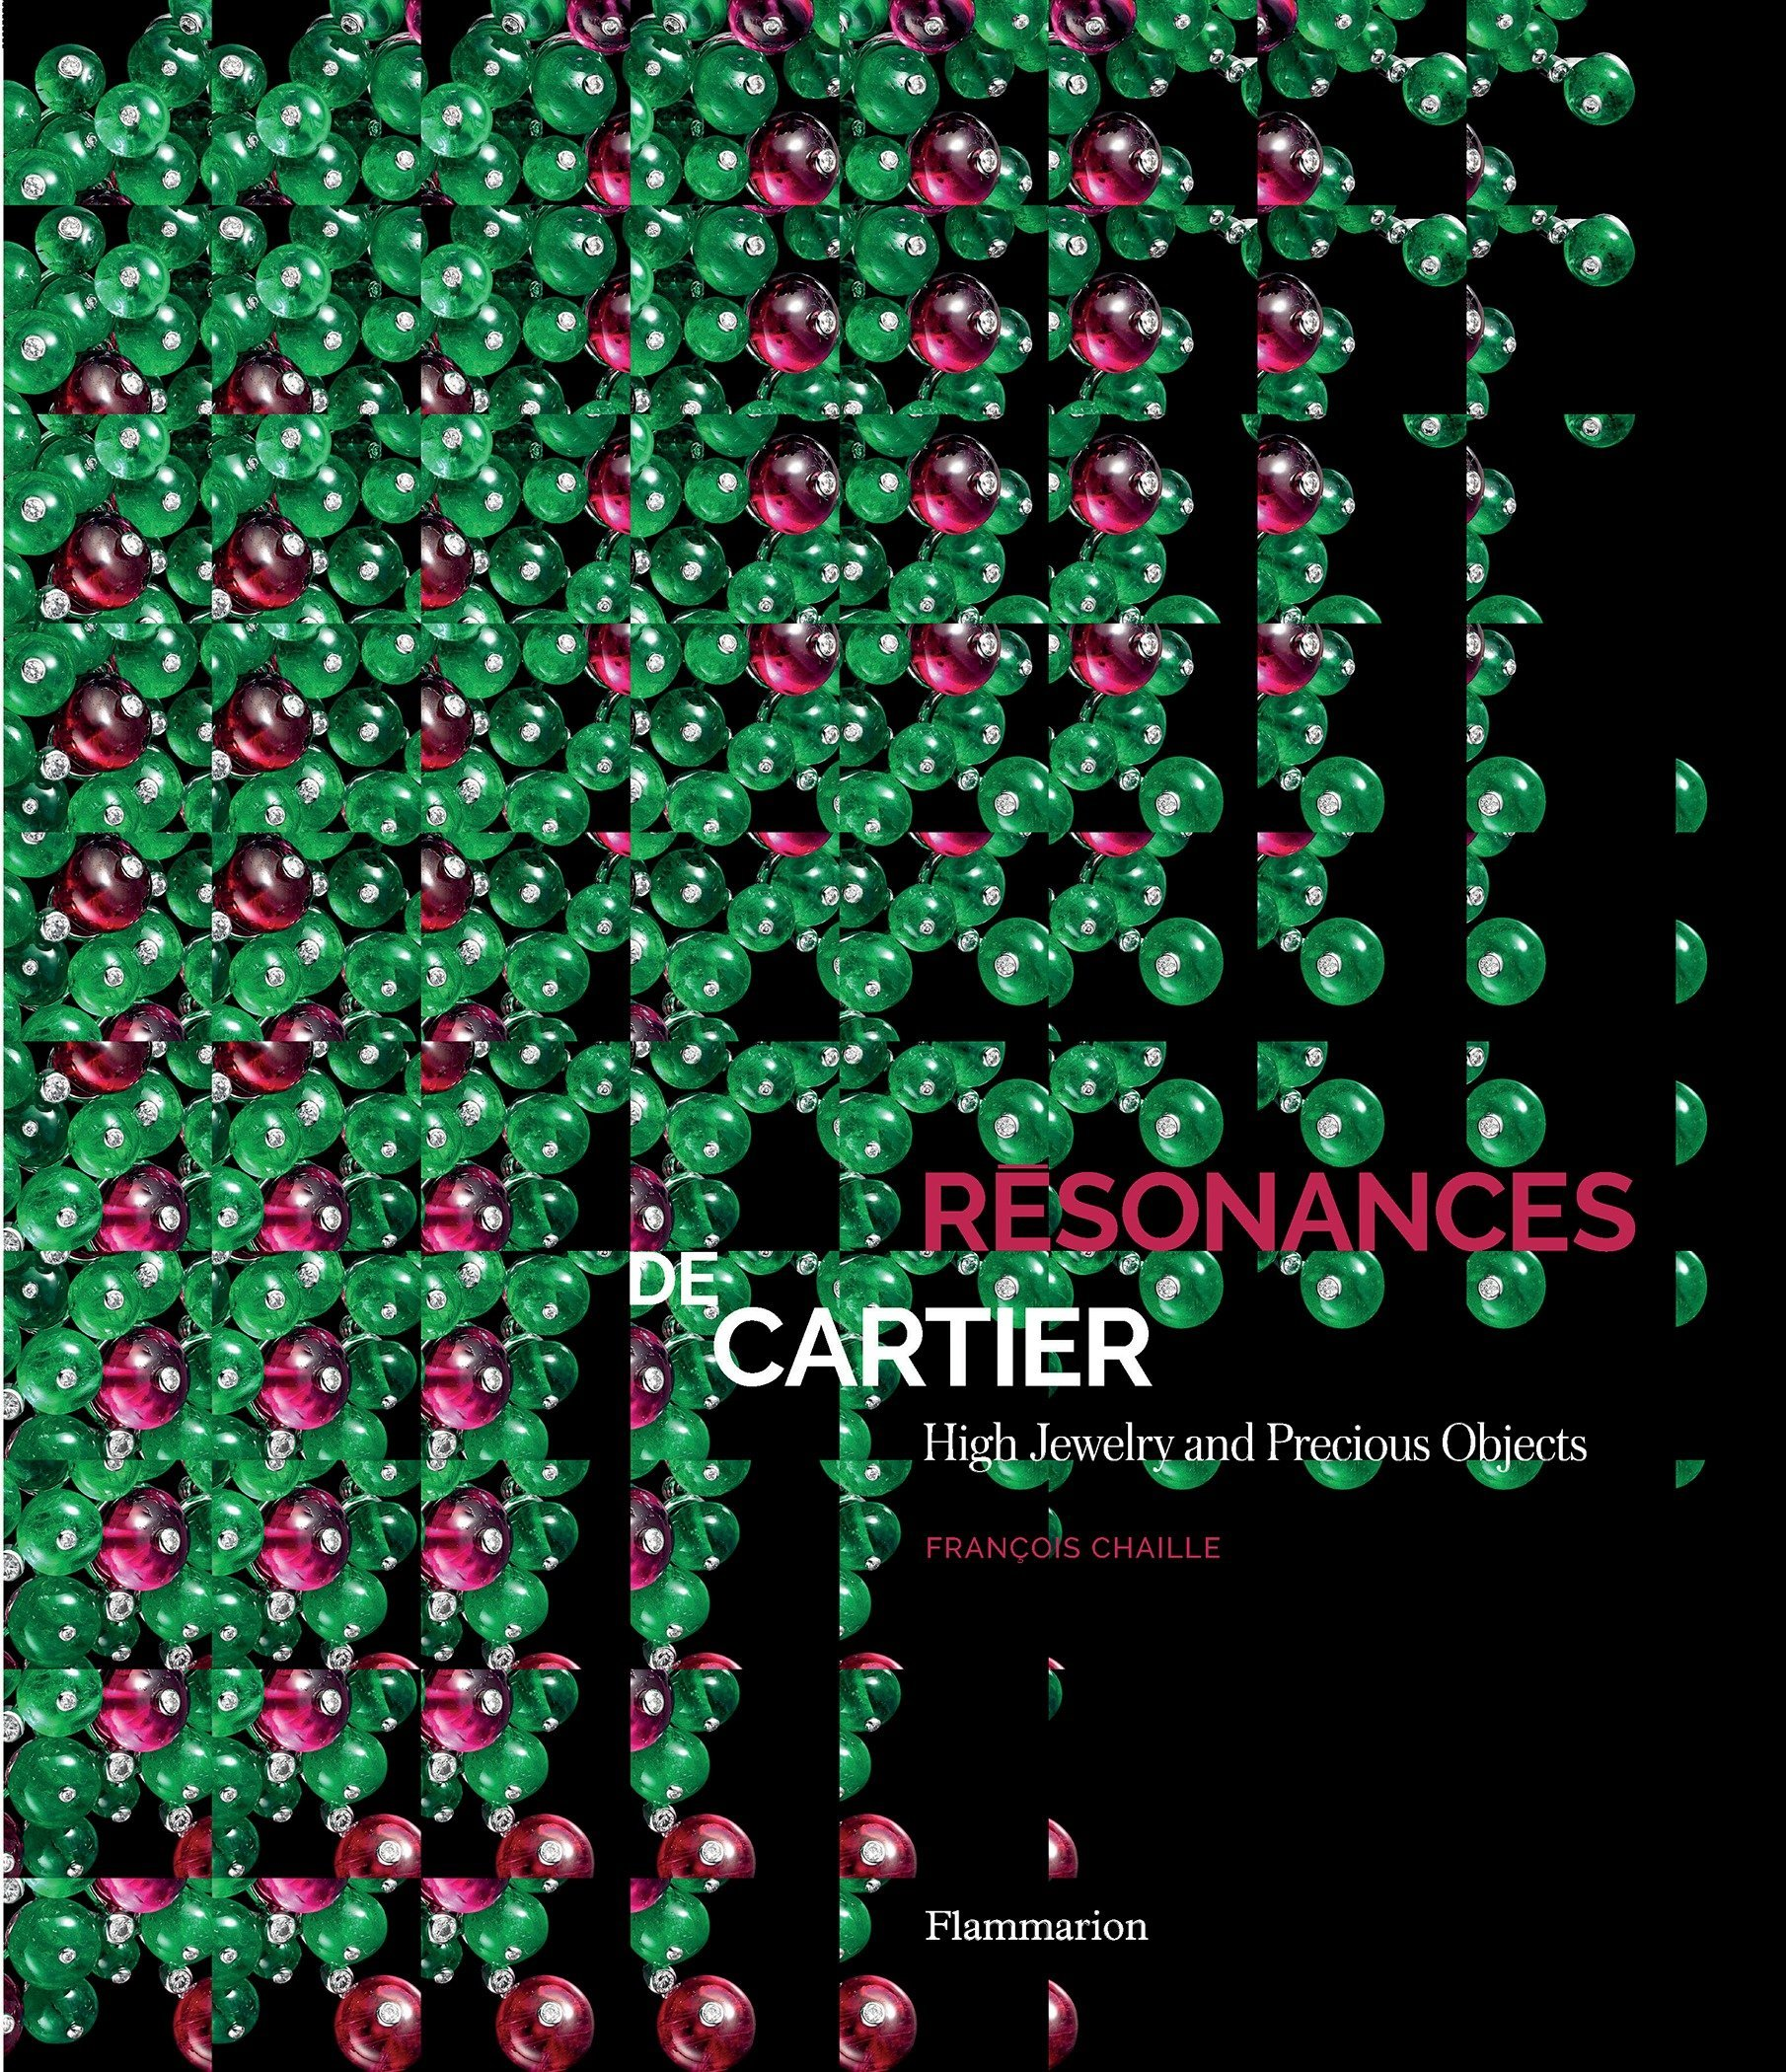 Resonances de Cartier: High Jewelry and Precious Objects